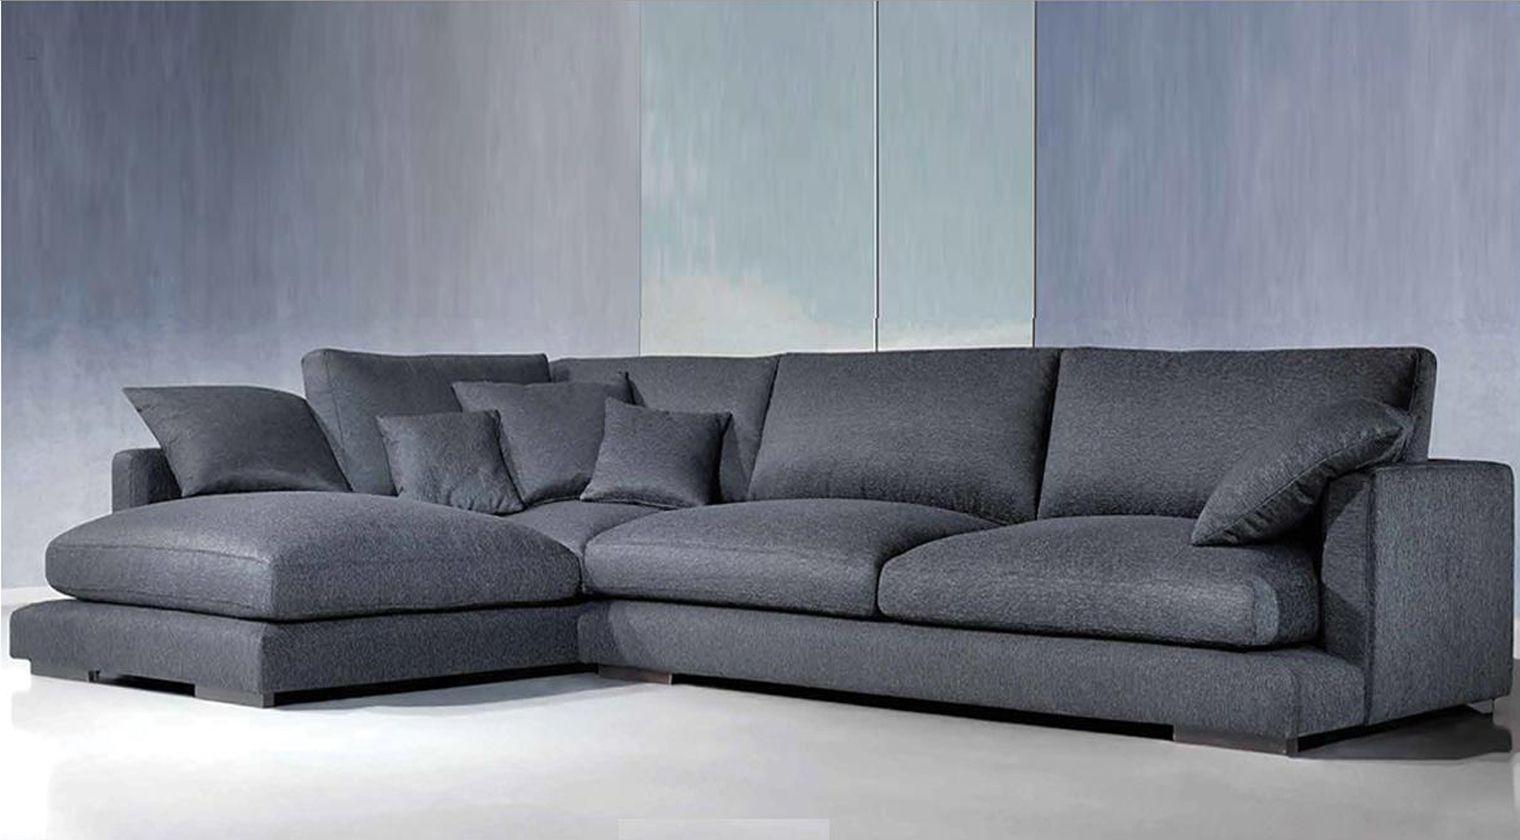 Sofas De 4 Plazas Tqd3 Chaise Longue Tela Perseo Aise Longue Tela